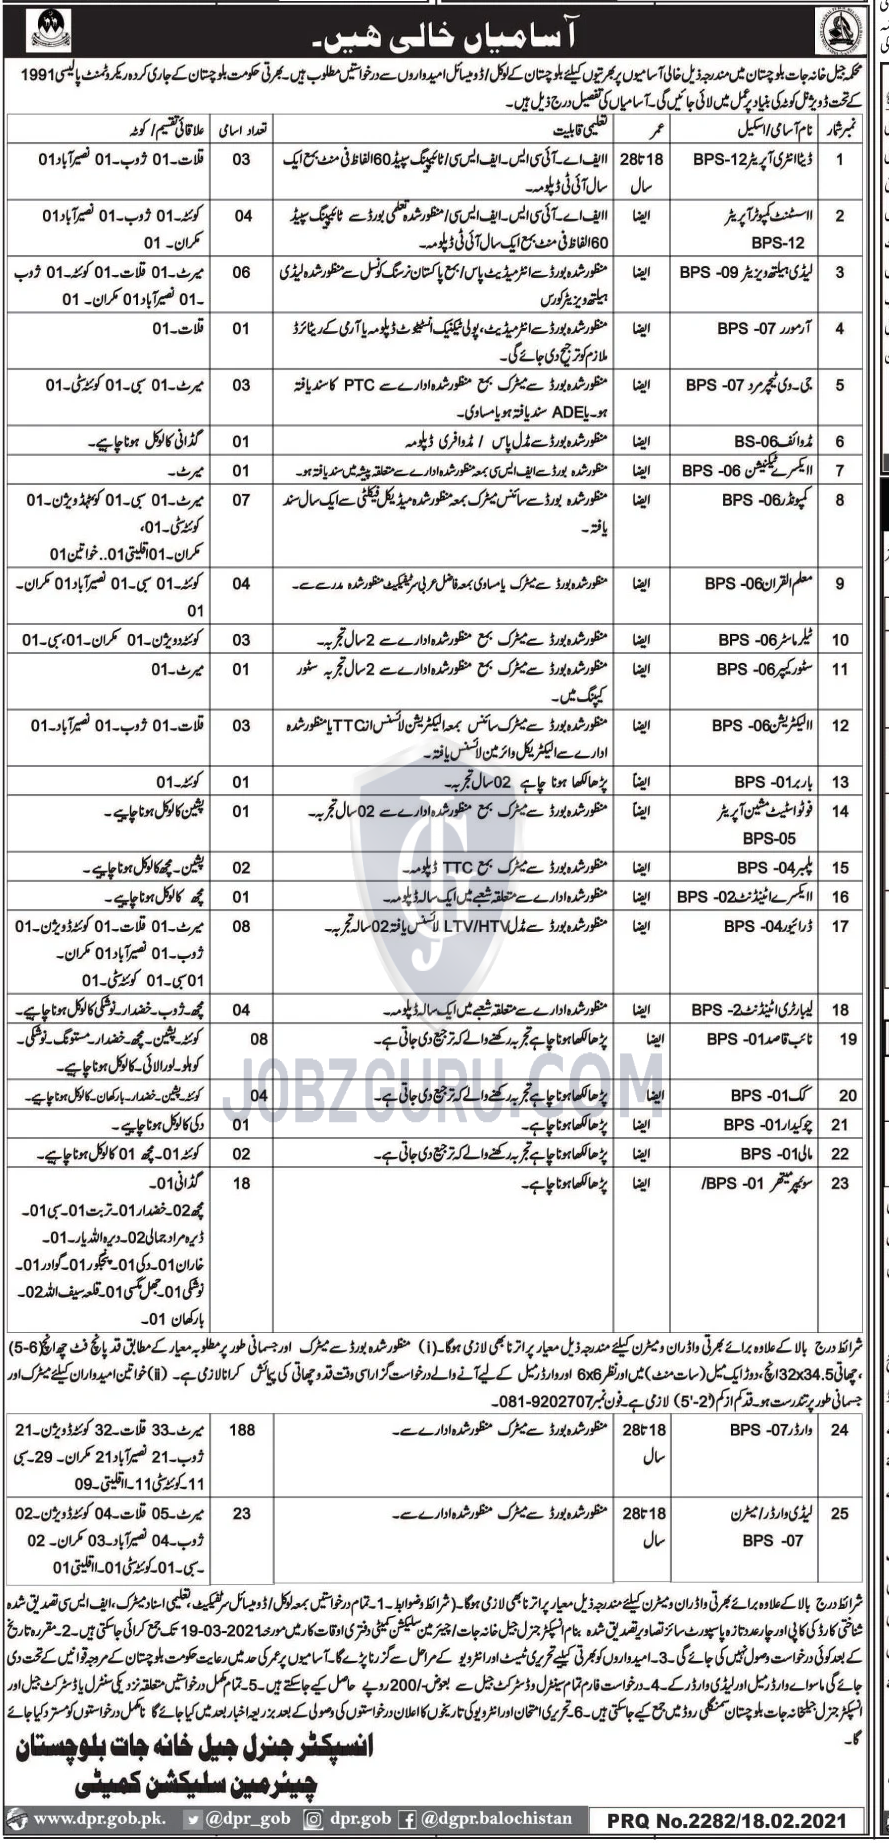 prison department latest jobs 2021 government pakistan